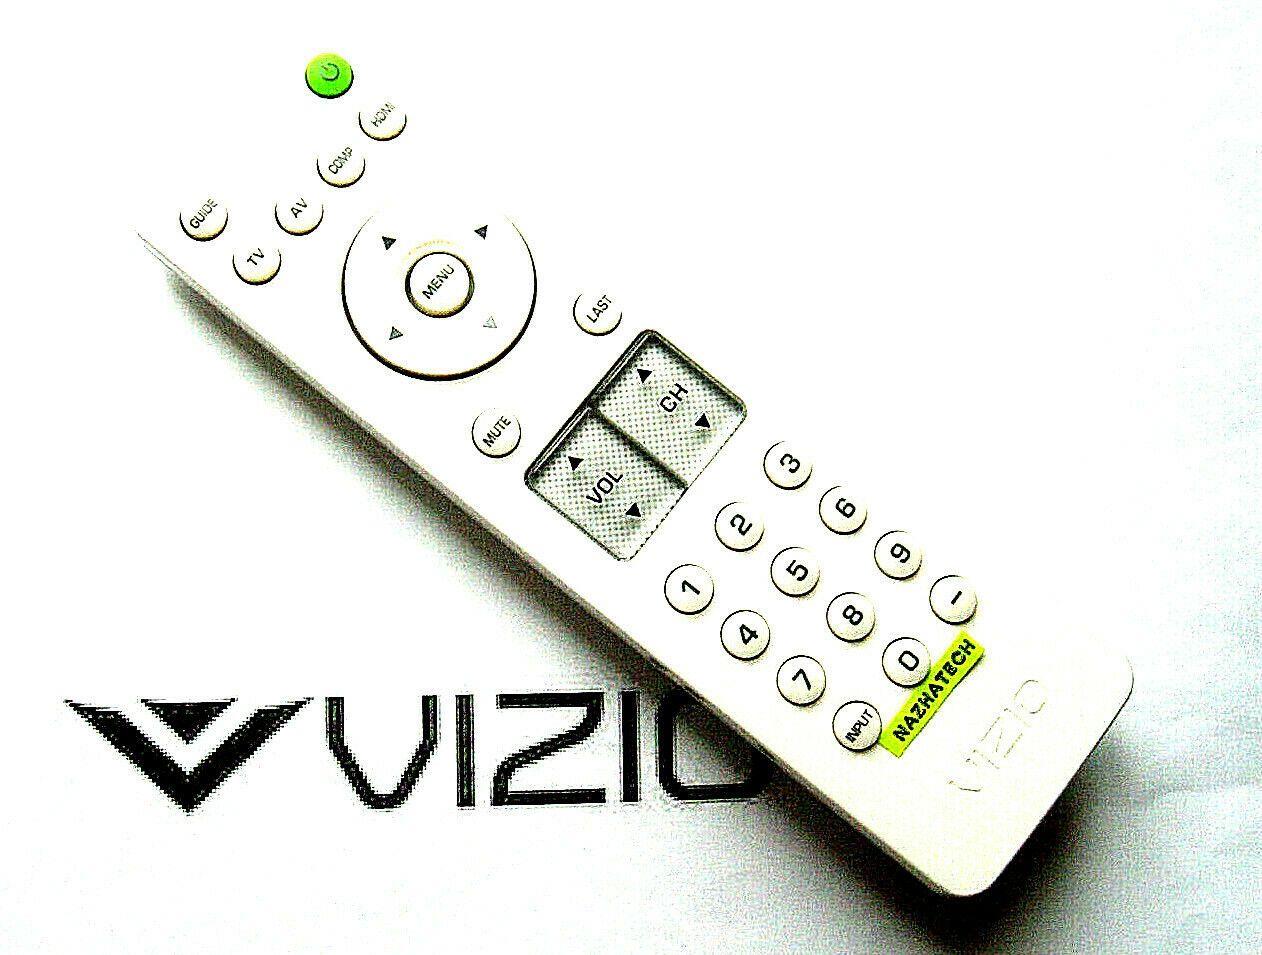 2 Abs Tv Remote Control Organizer Storage Stand Holder Hook Control Seat